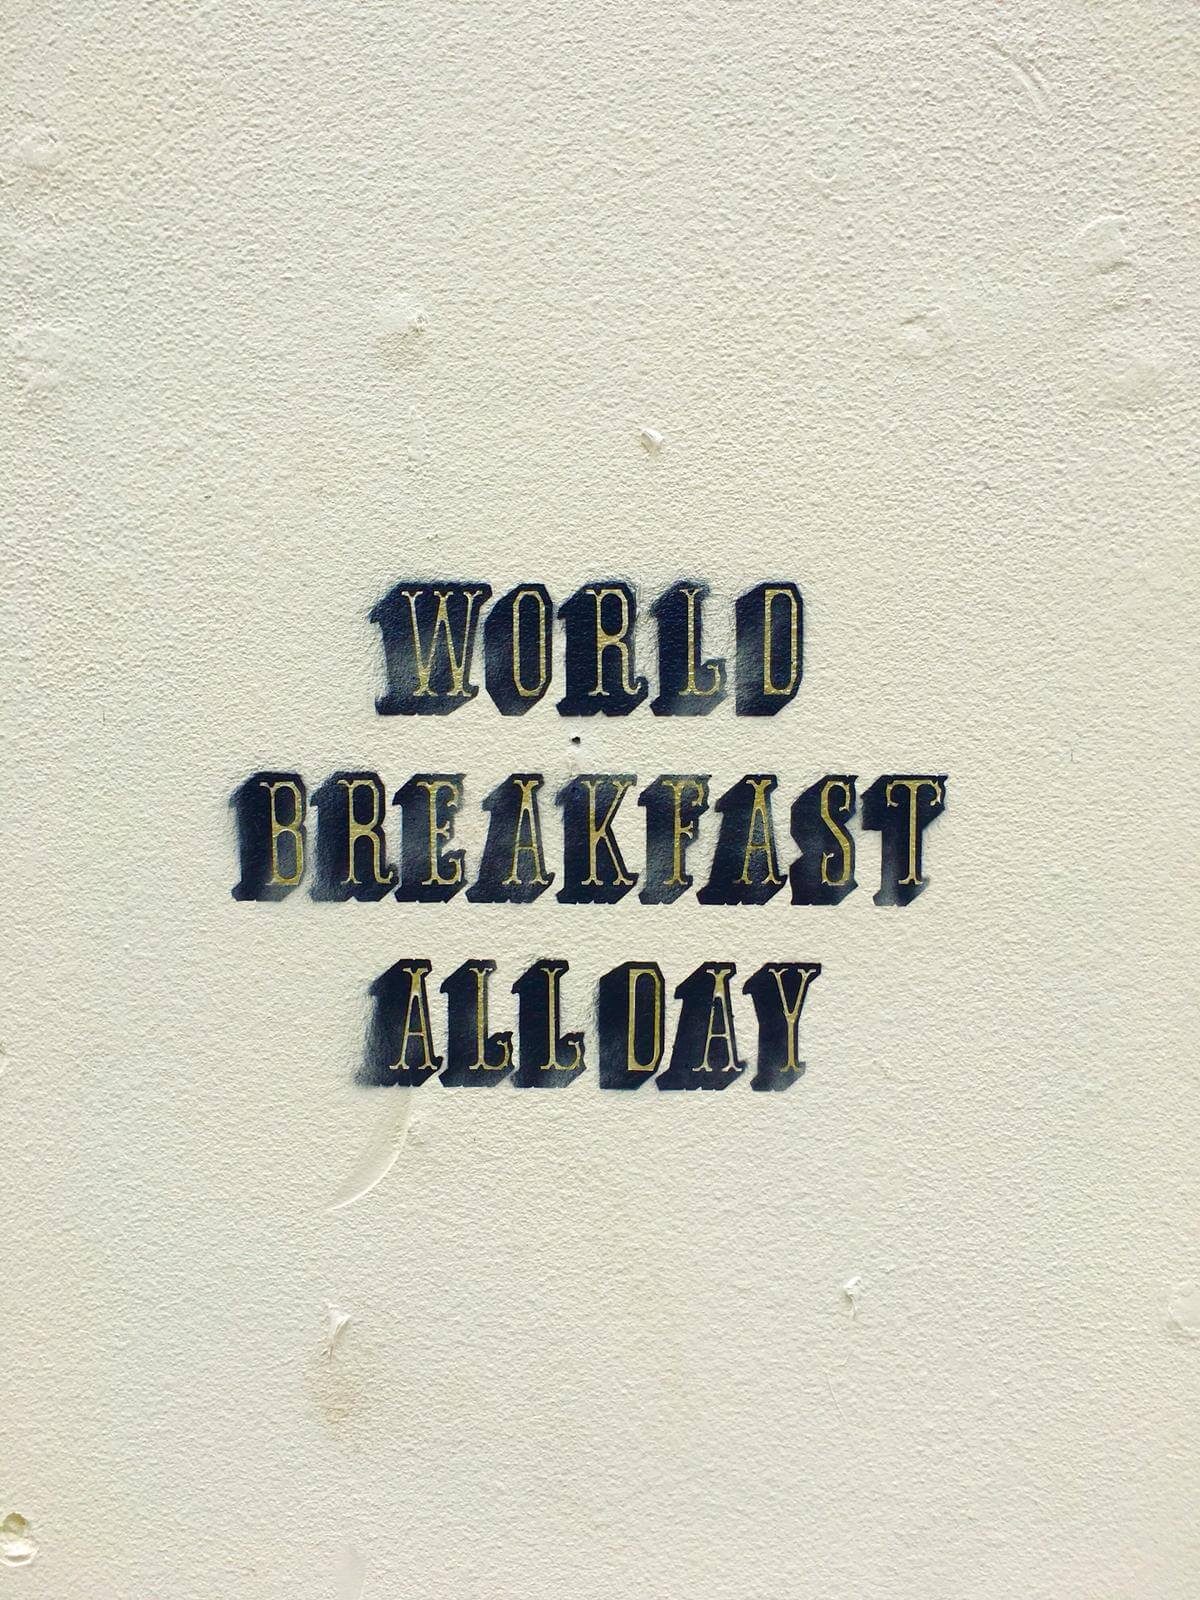 world-breakfast-allday2-2